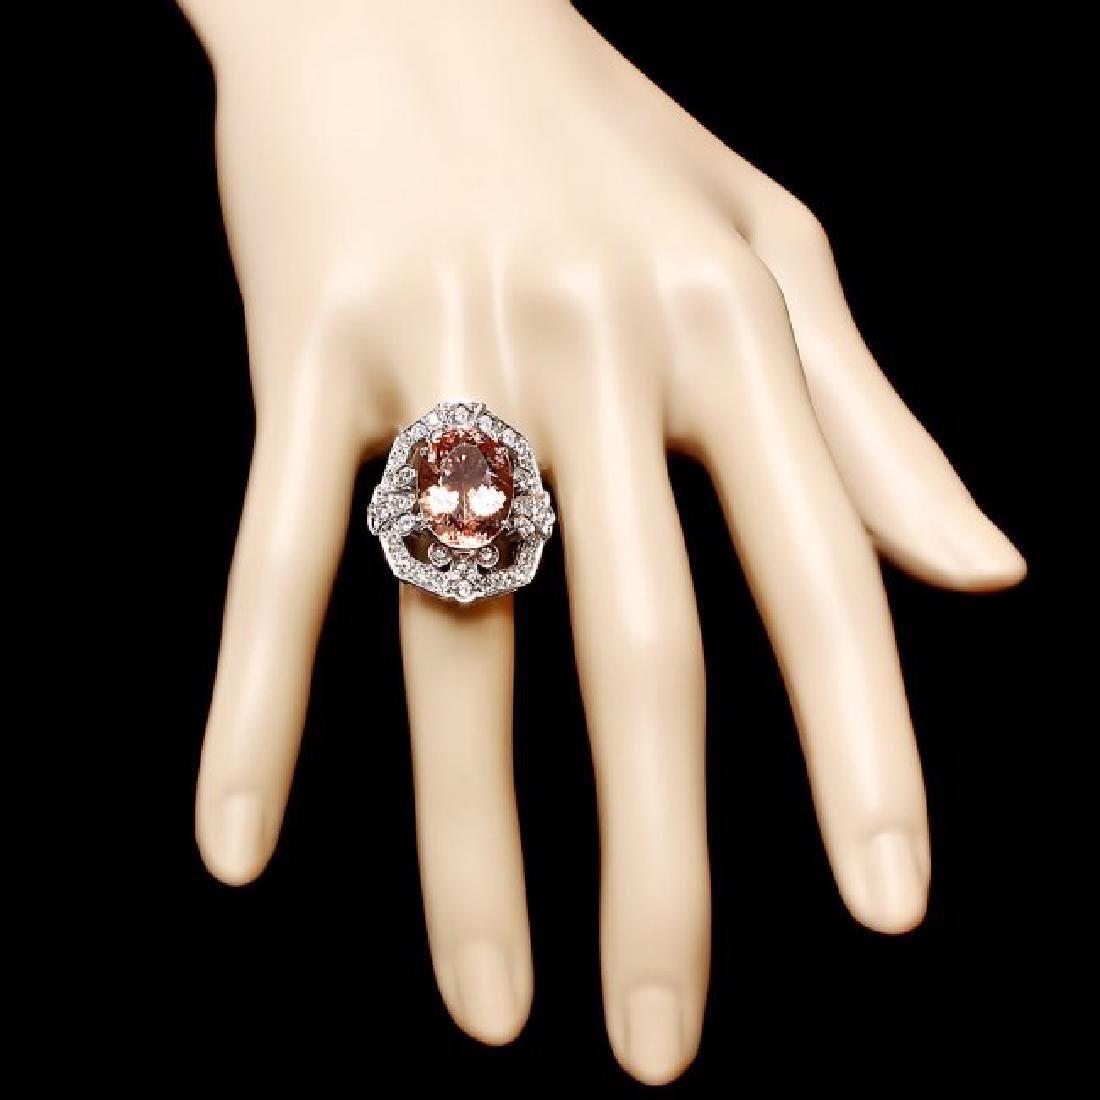 14k Gold 7.50ct Morganite 1.35ct Diamond Ring - 4